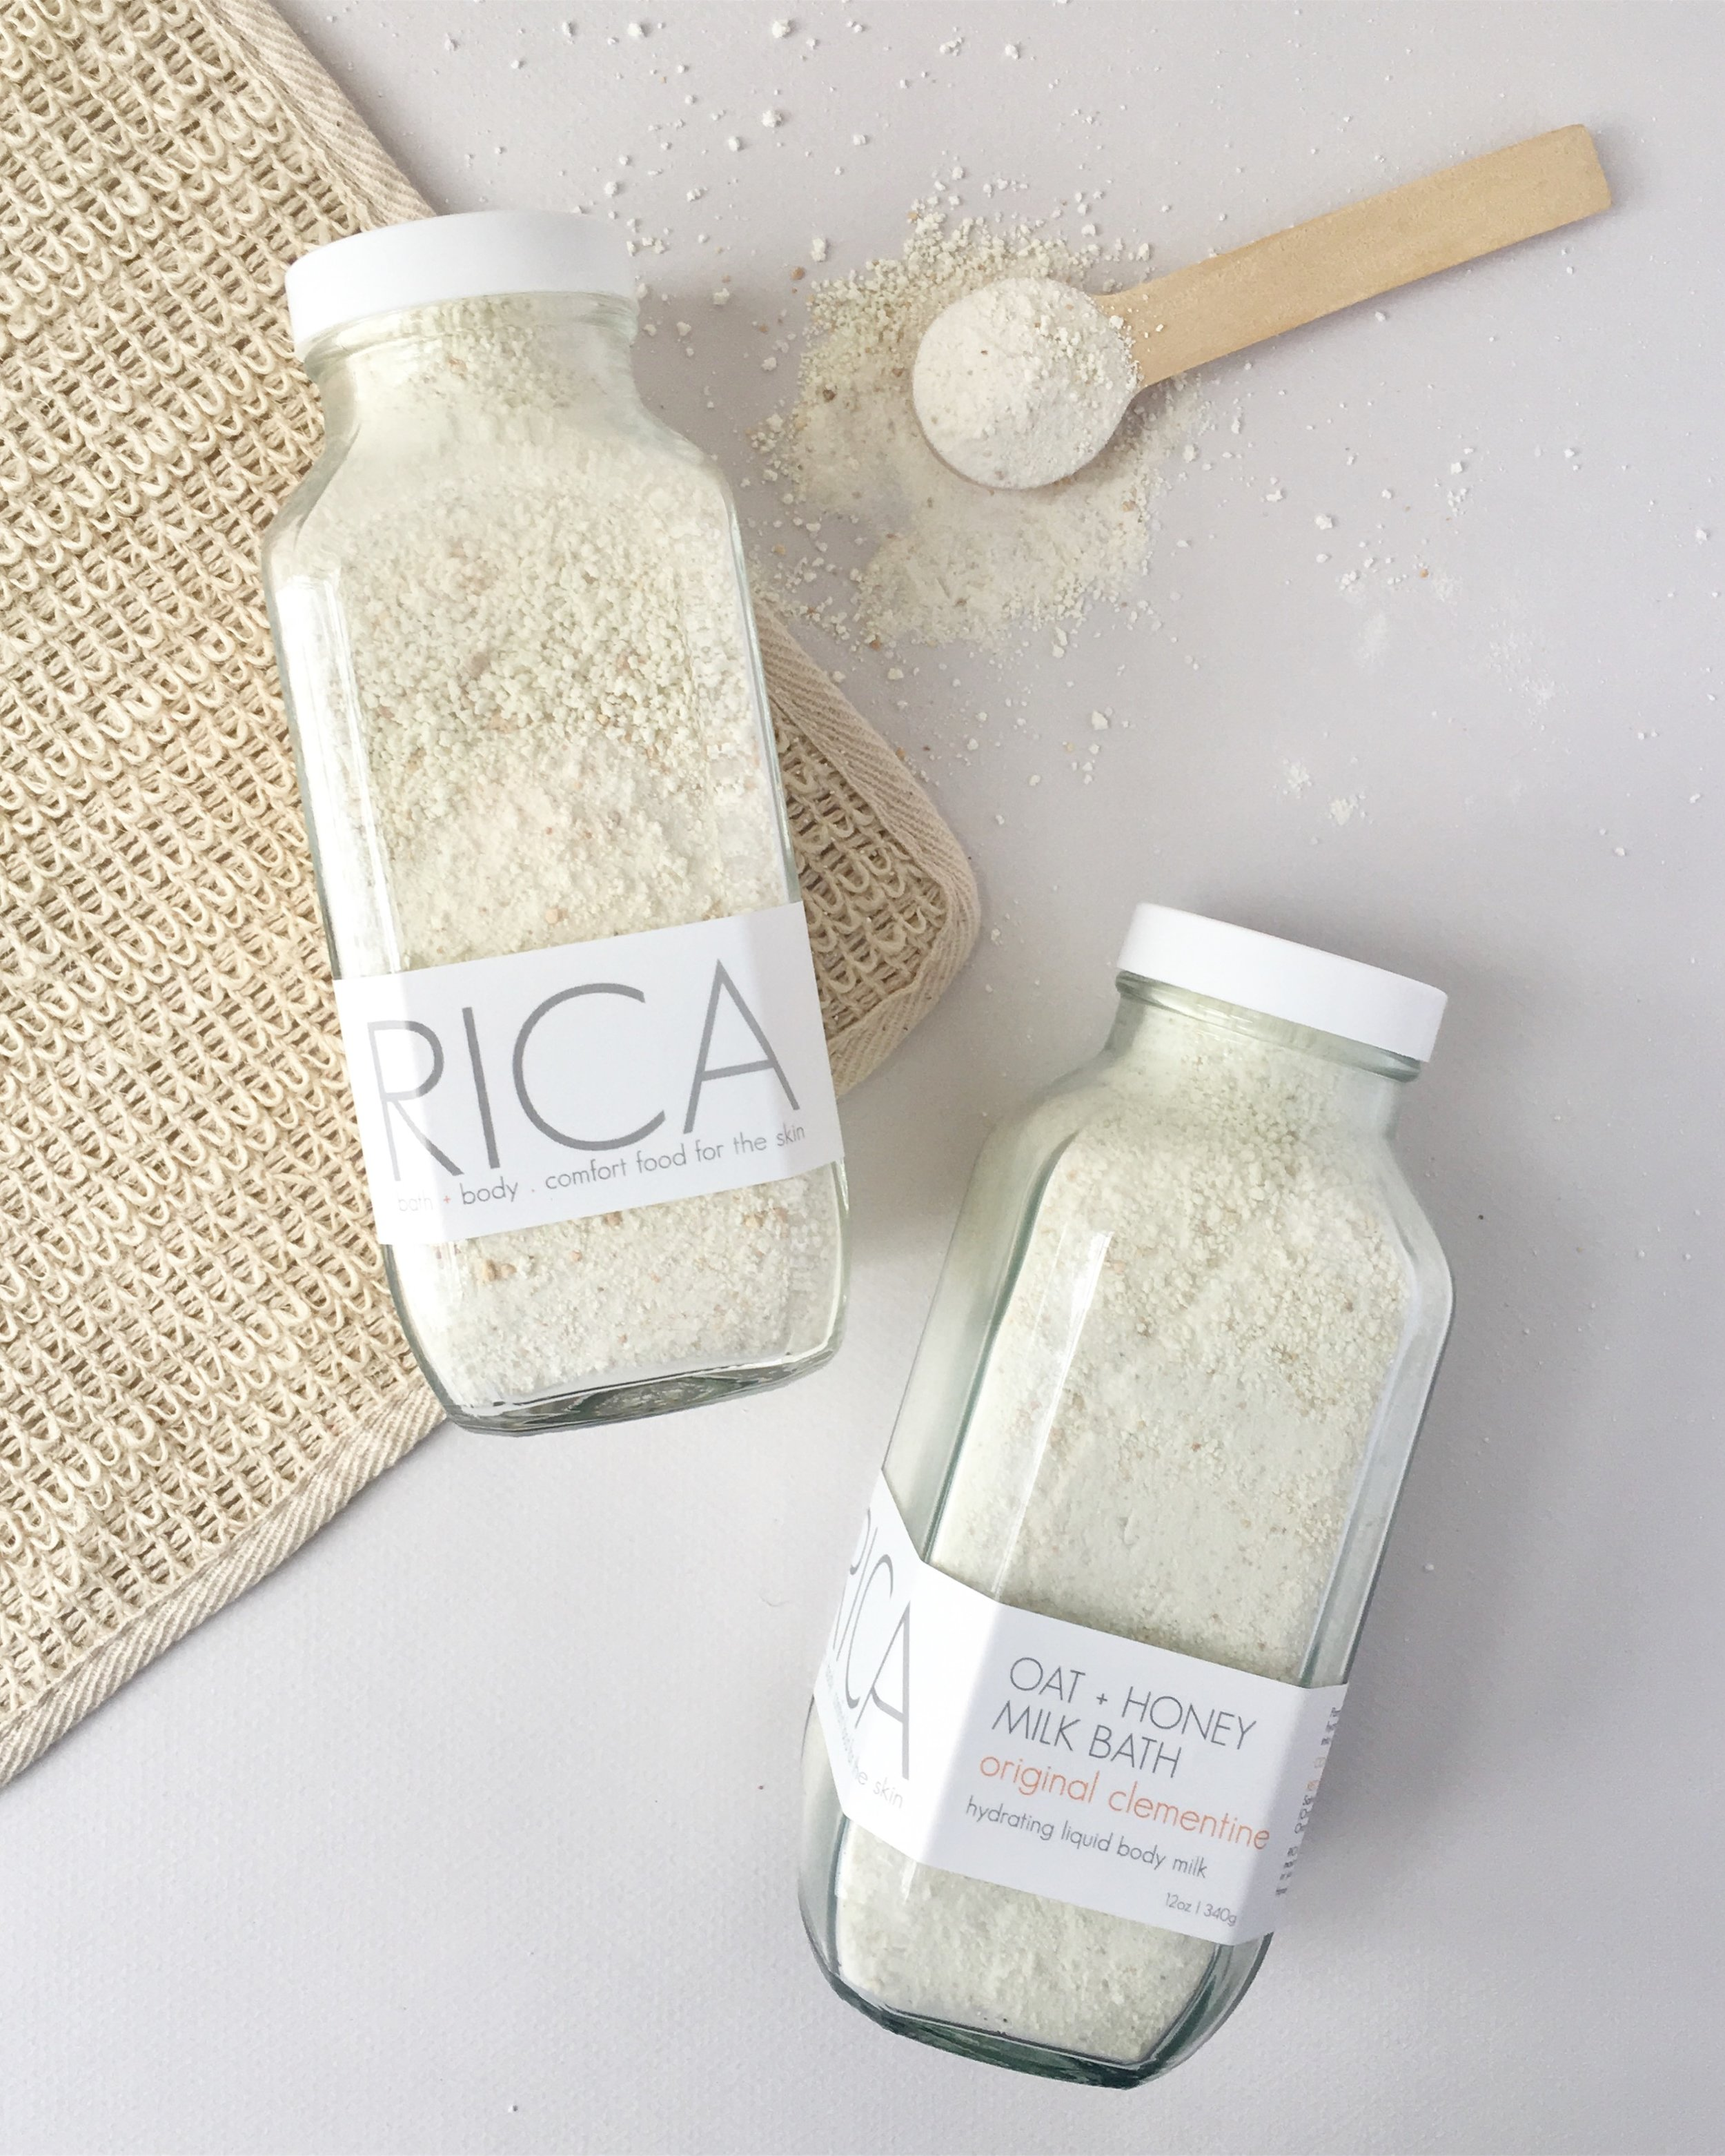 RICA bath + body Oat + Honey Milk Bath Original Clementine Tall 2 jars with spoon.JPG